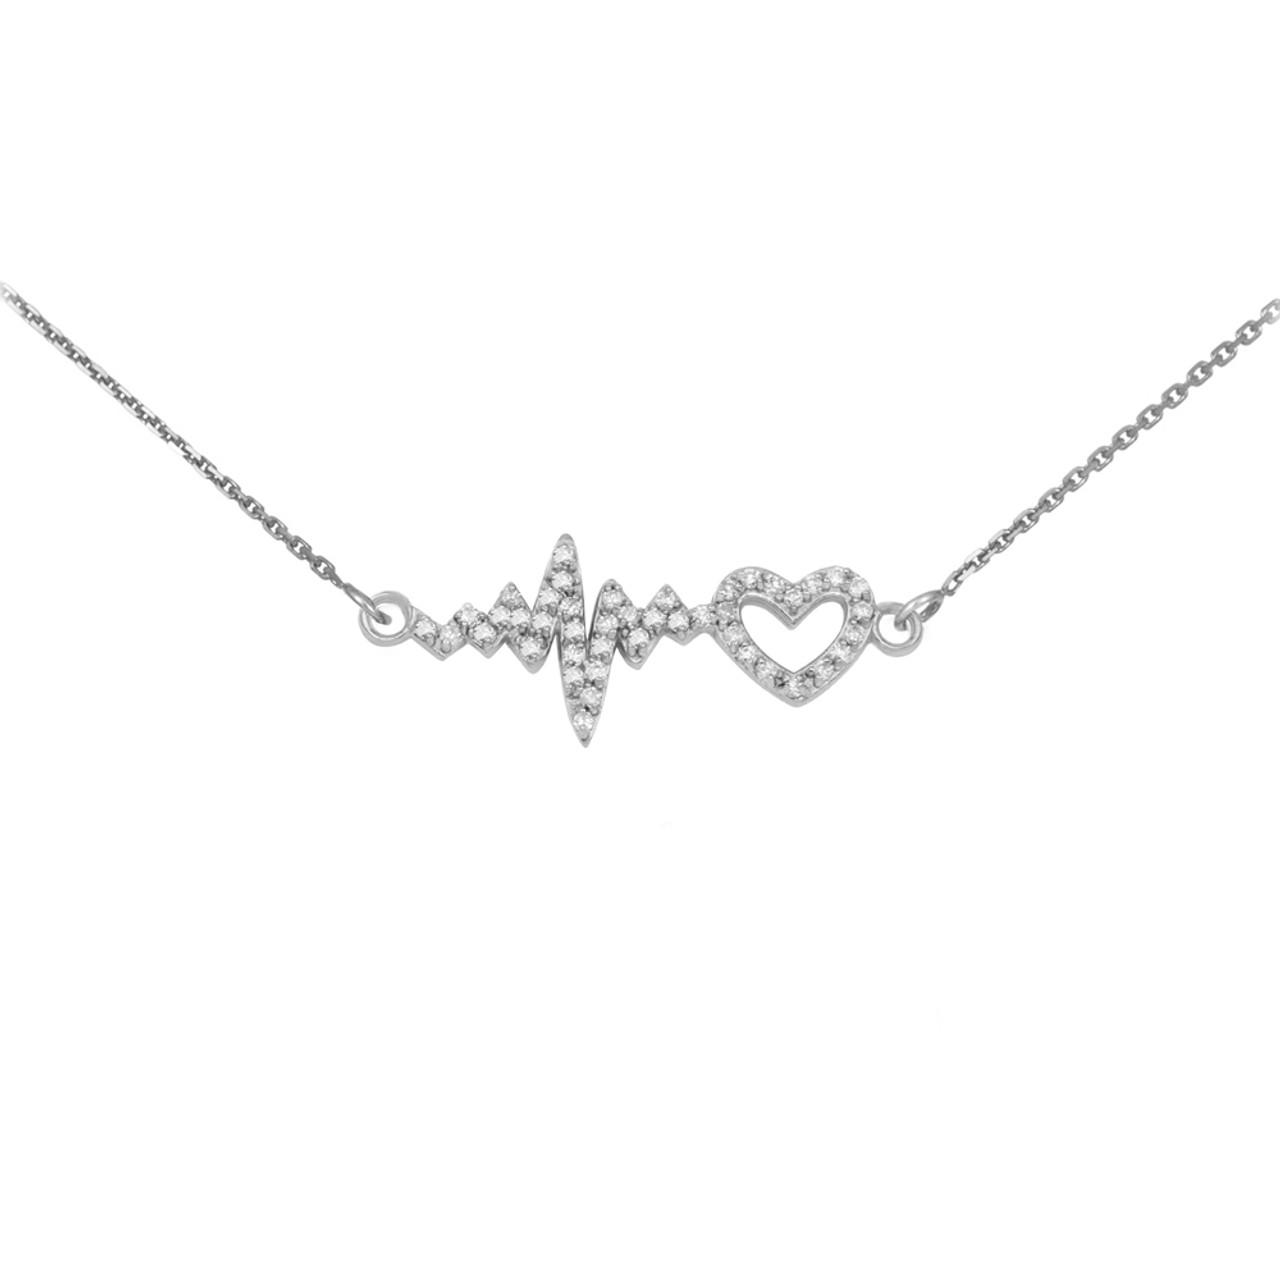 36a943d9620e 14K White Gold Lifeline Pulse Heartbeat Heart Diamond Pendant ...